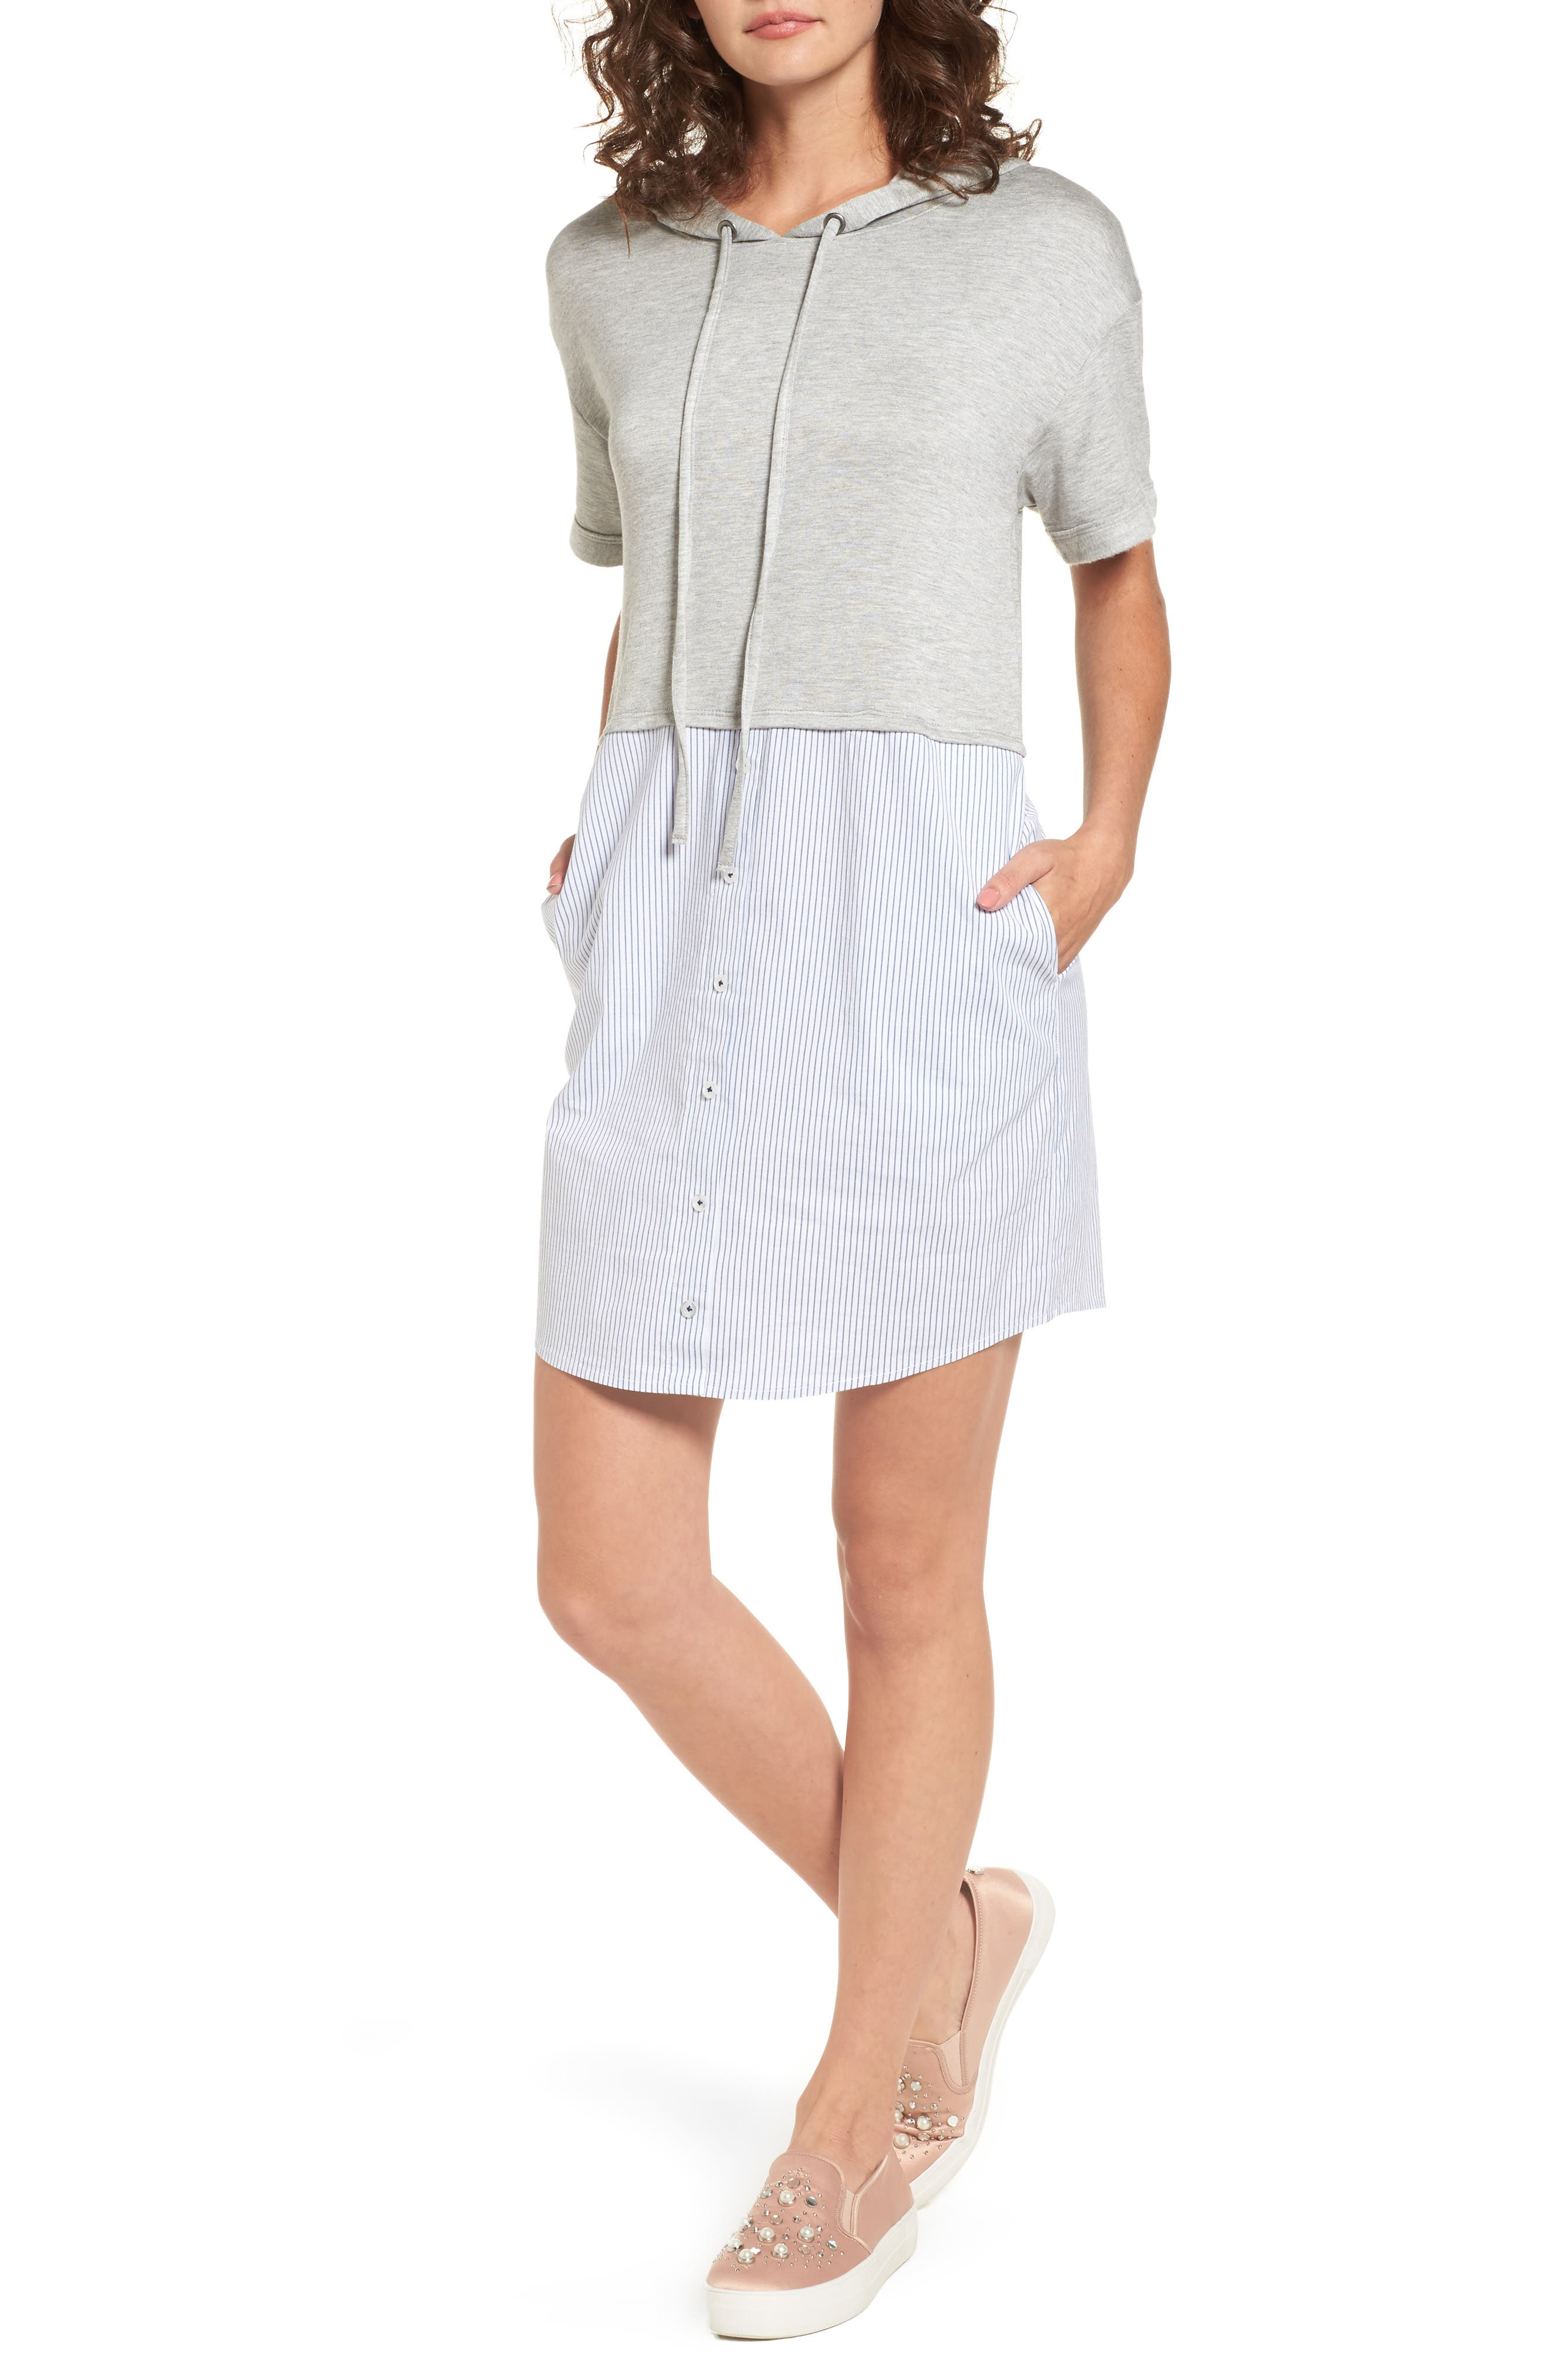 Main Image - Socialite Mixed Media Hoodie Dress